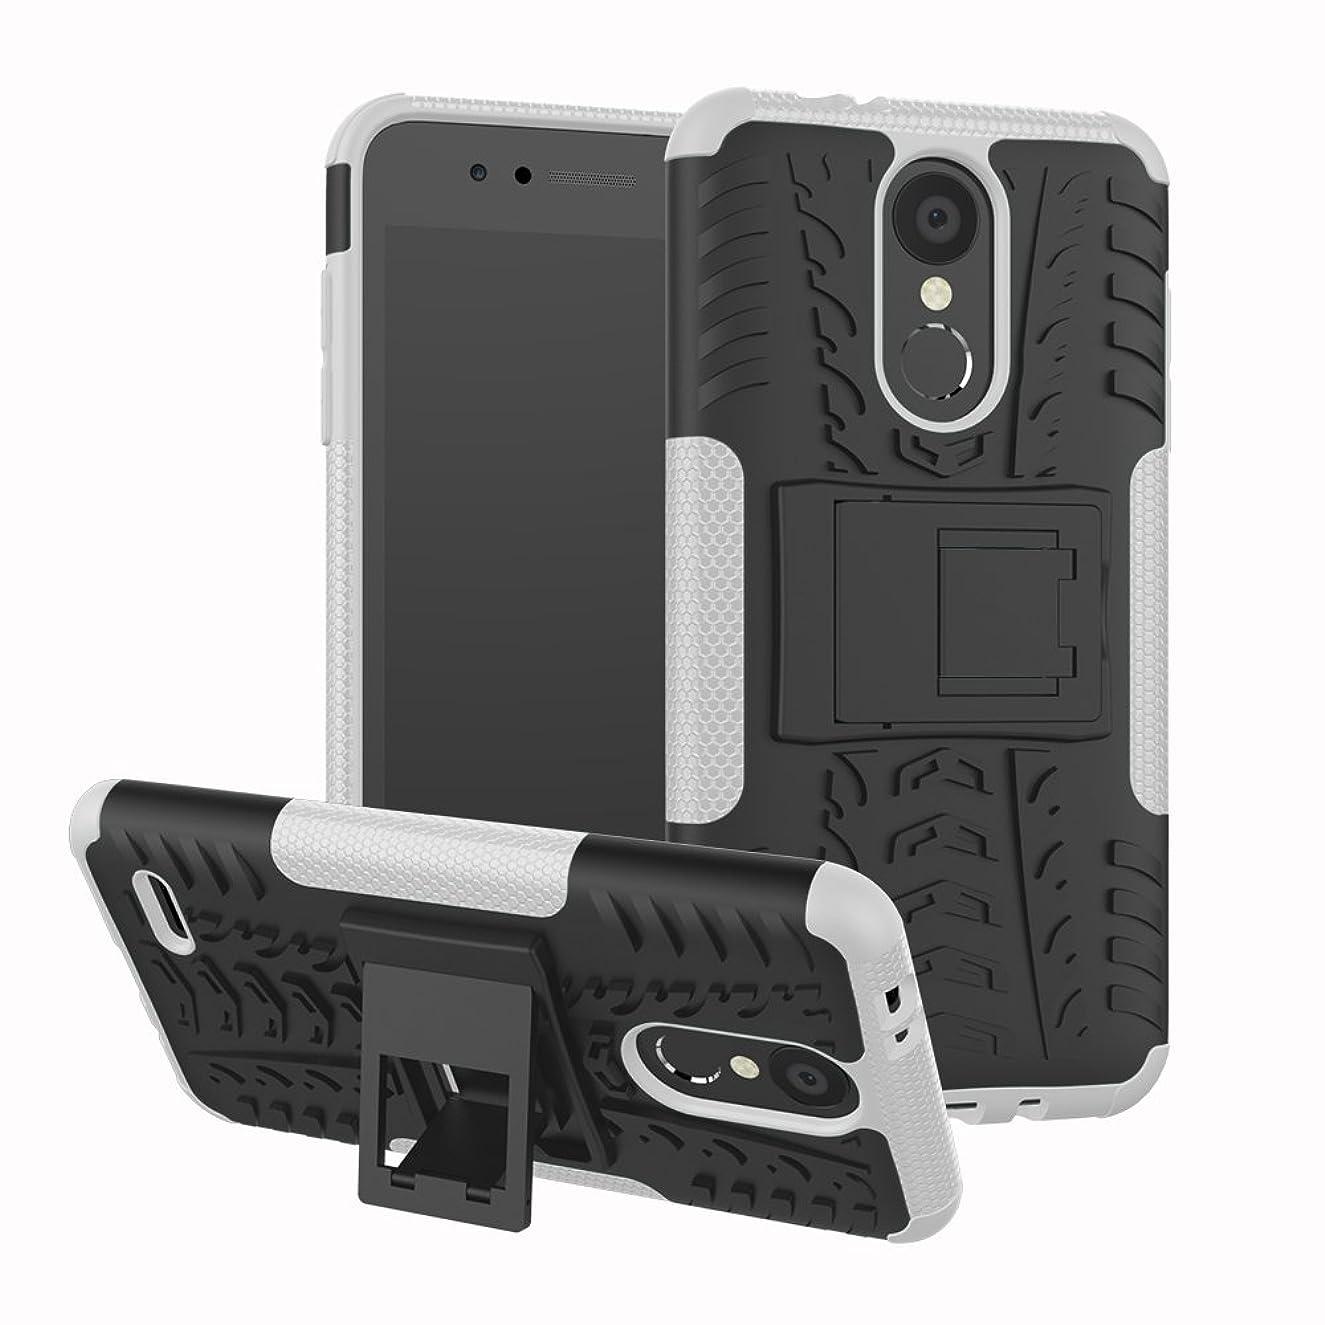 LG Aristo 2 Case, LG K8 (2018) Case, Dooge Dual Layer Slim Thin TPU+PC Bumper Heavy Duty High Impact Durable Rugged Anti-Slip Shock Absorption Protective Case for LG K8 2018